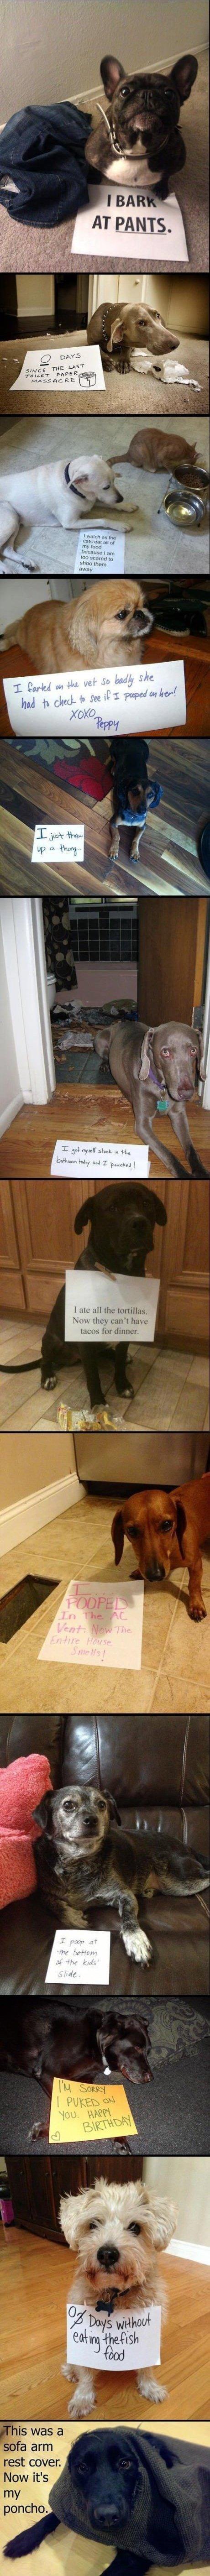 Ledsna hundar